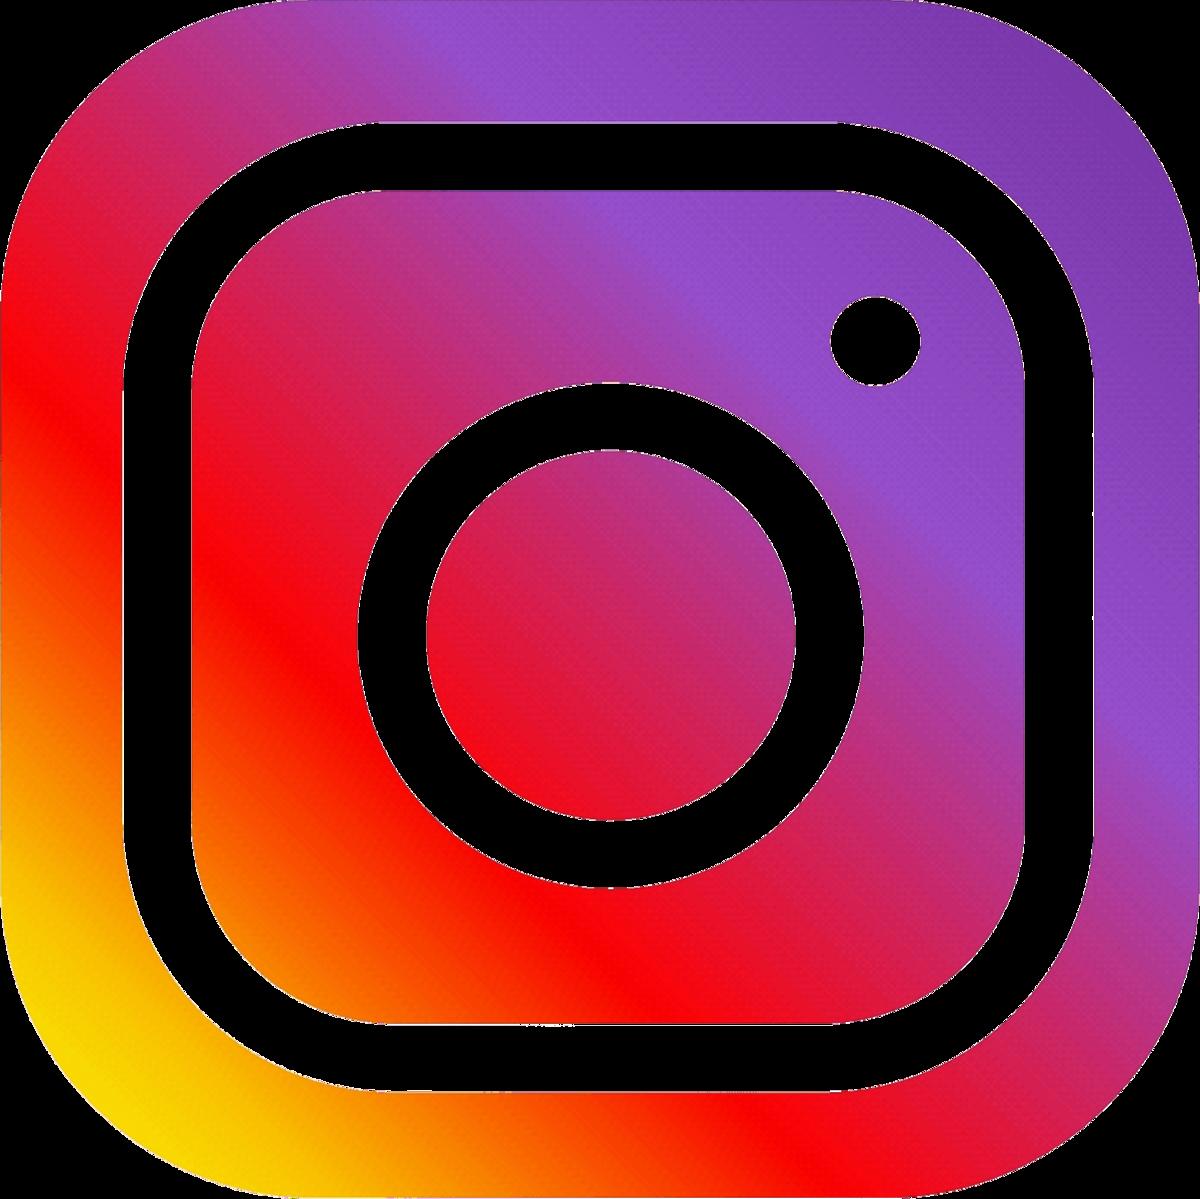 https://www.instagram.com/dws_pta/?hl=en